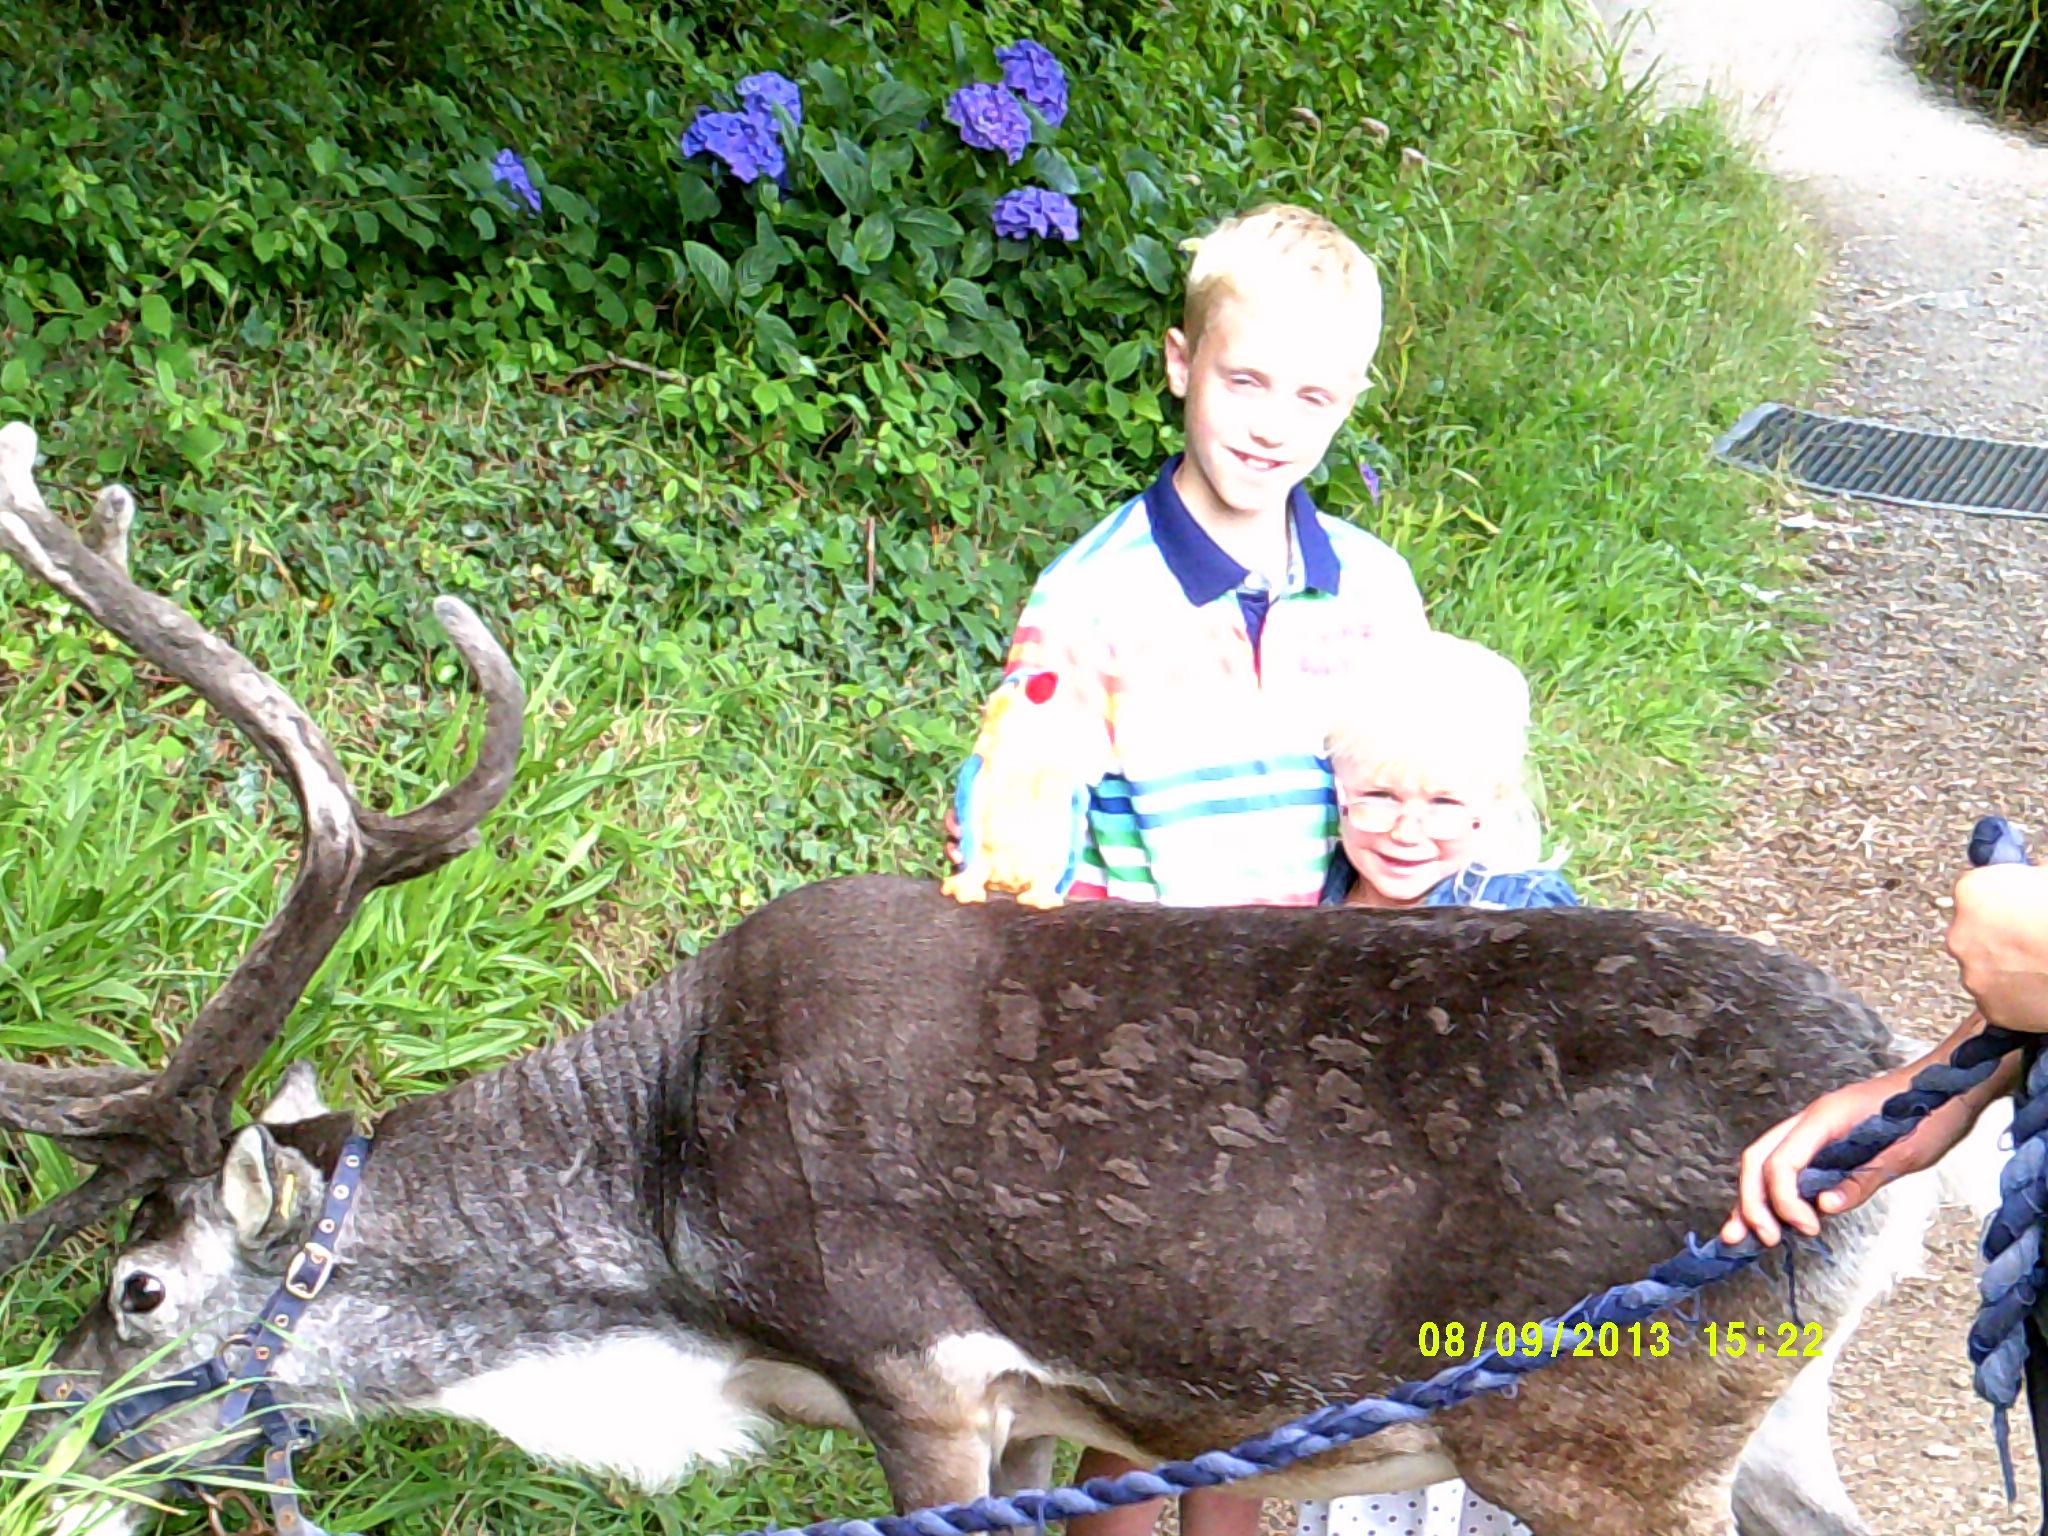 kernow u0026 39 s adventure day trip at dartmoor zoo